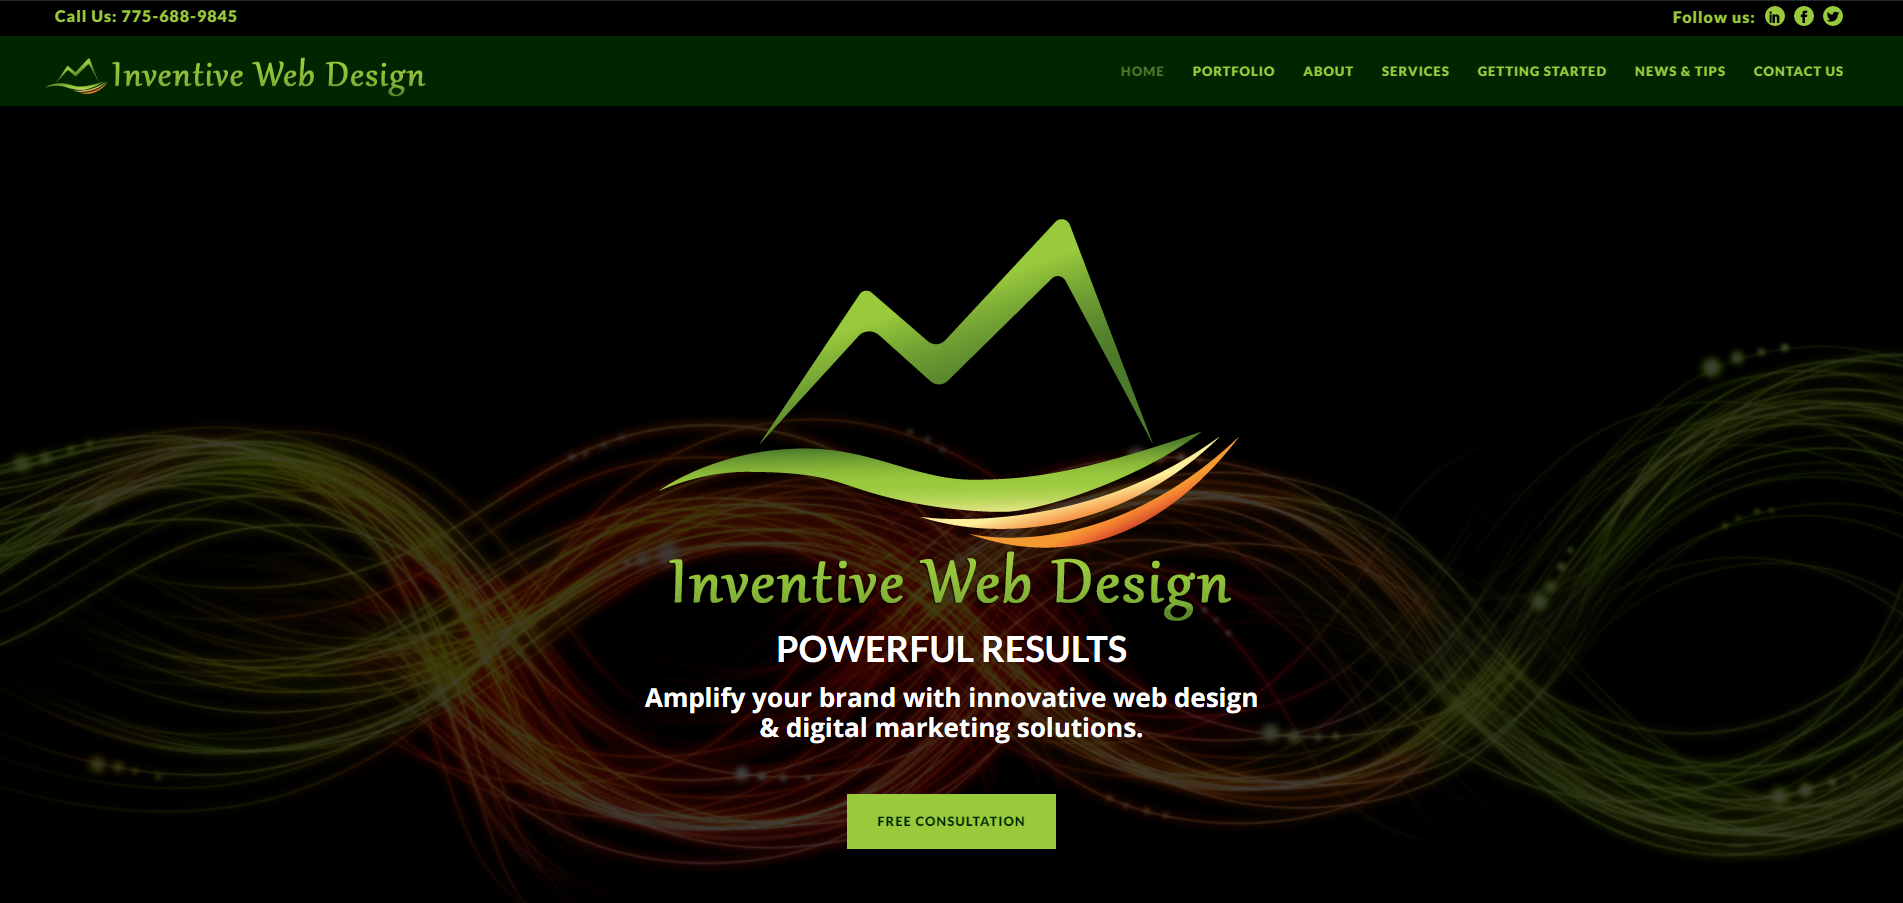 Standard Website - Desktop Computer - Inventive Web Design